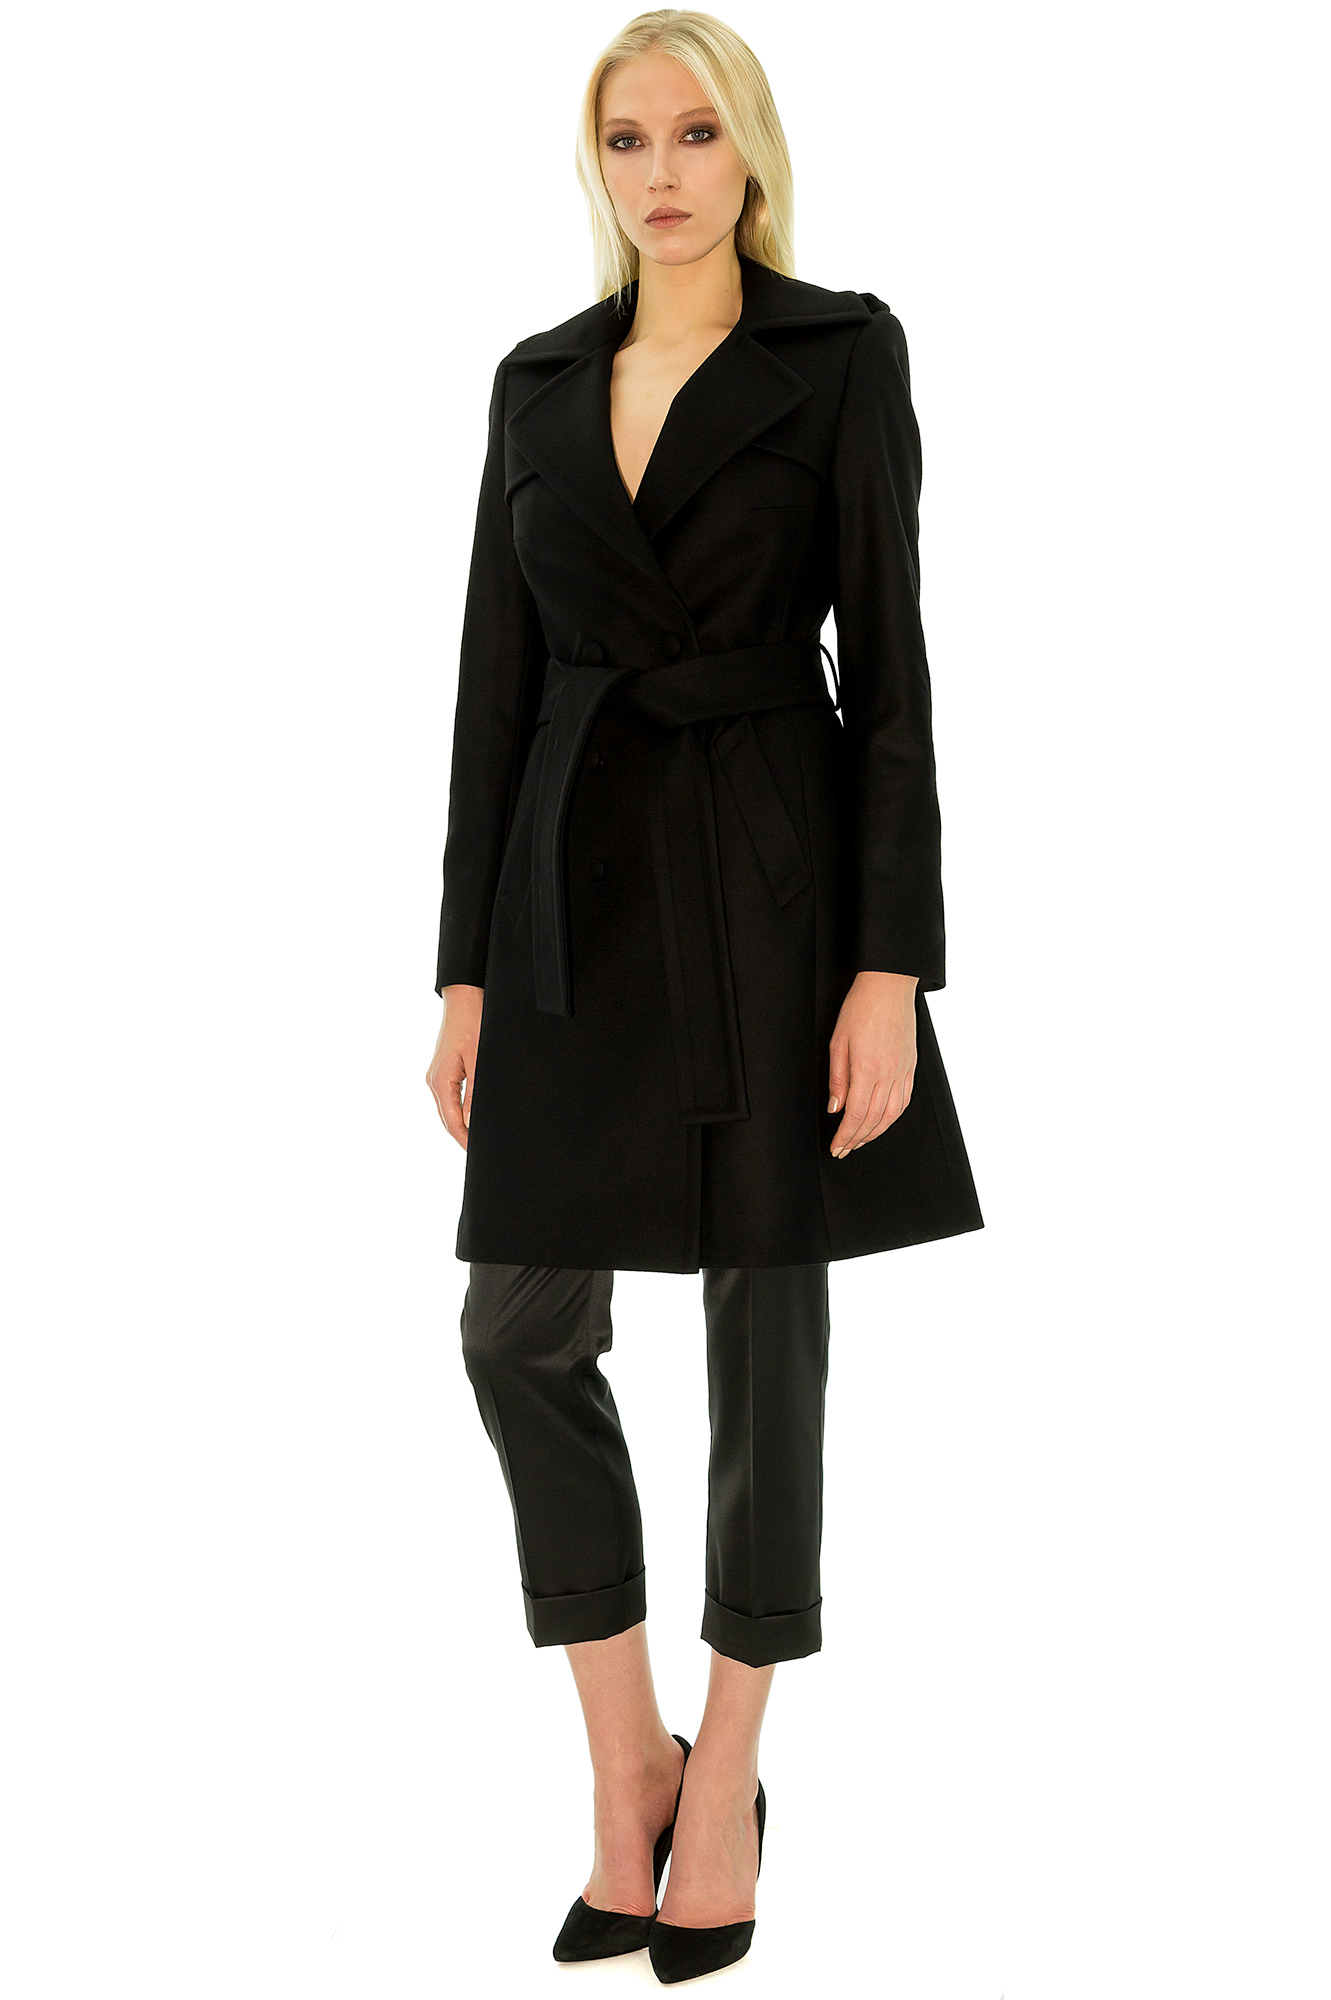 manteau femme mi long noir. Black Bedroom Furniture Sets. Home Design Ideas